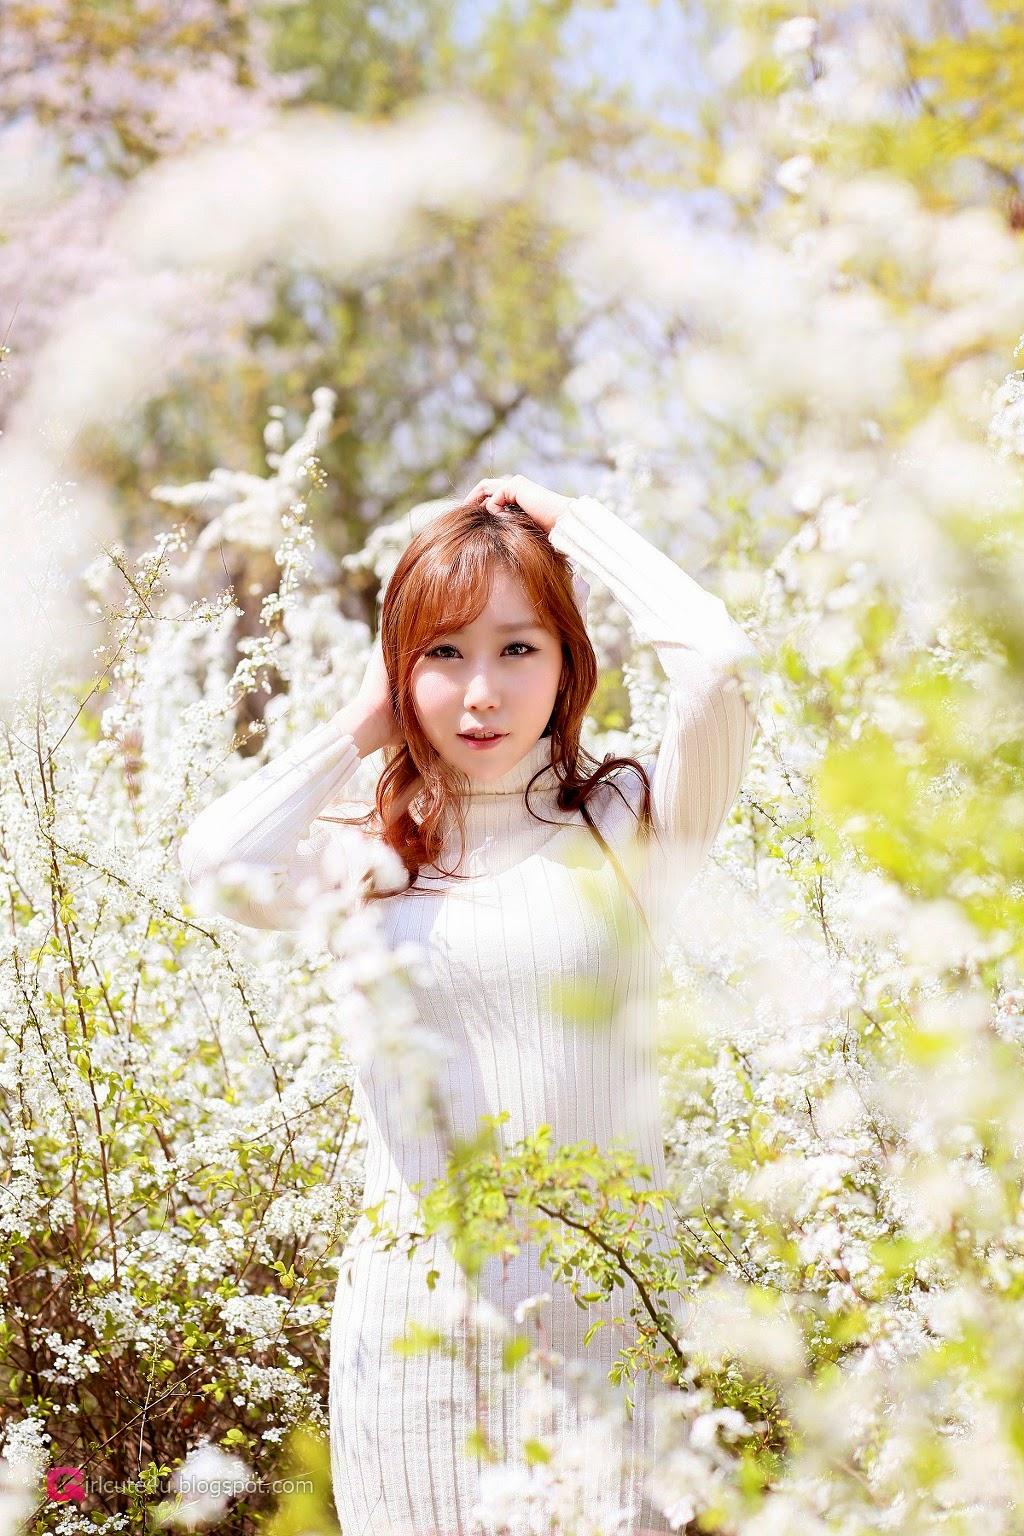 4 Kim Da On - Down By The River - very cute asian girl-girlcute4u.blogspot.com